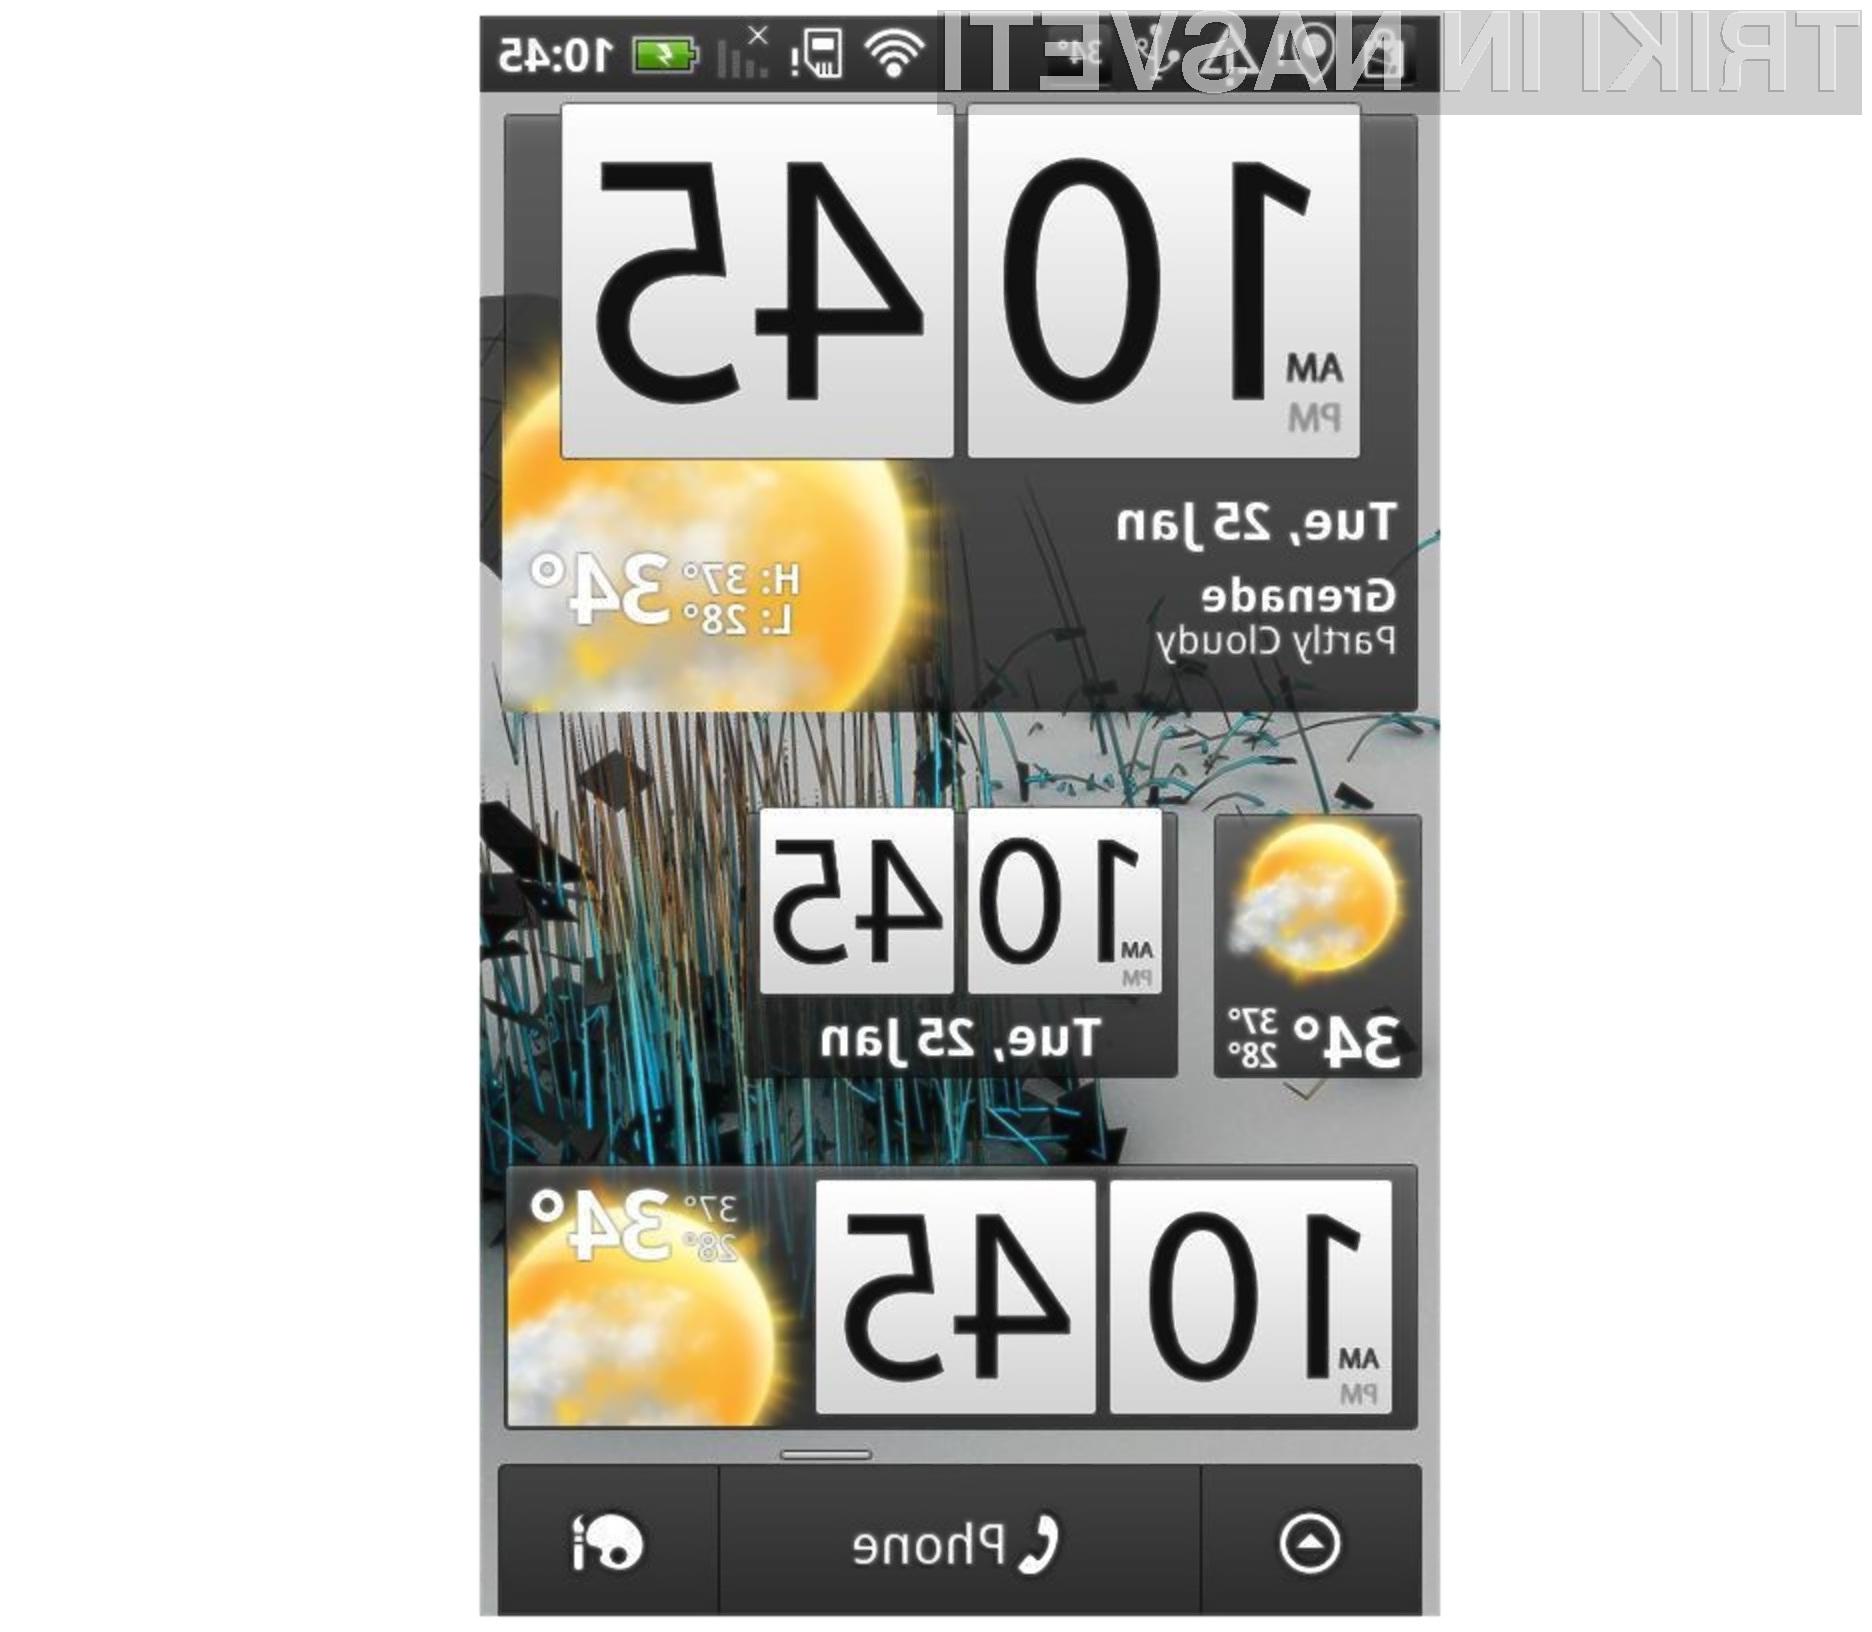 Programska oprema Beautiful Widgets Lite se odlično prilega mobilnikom Android.